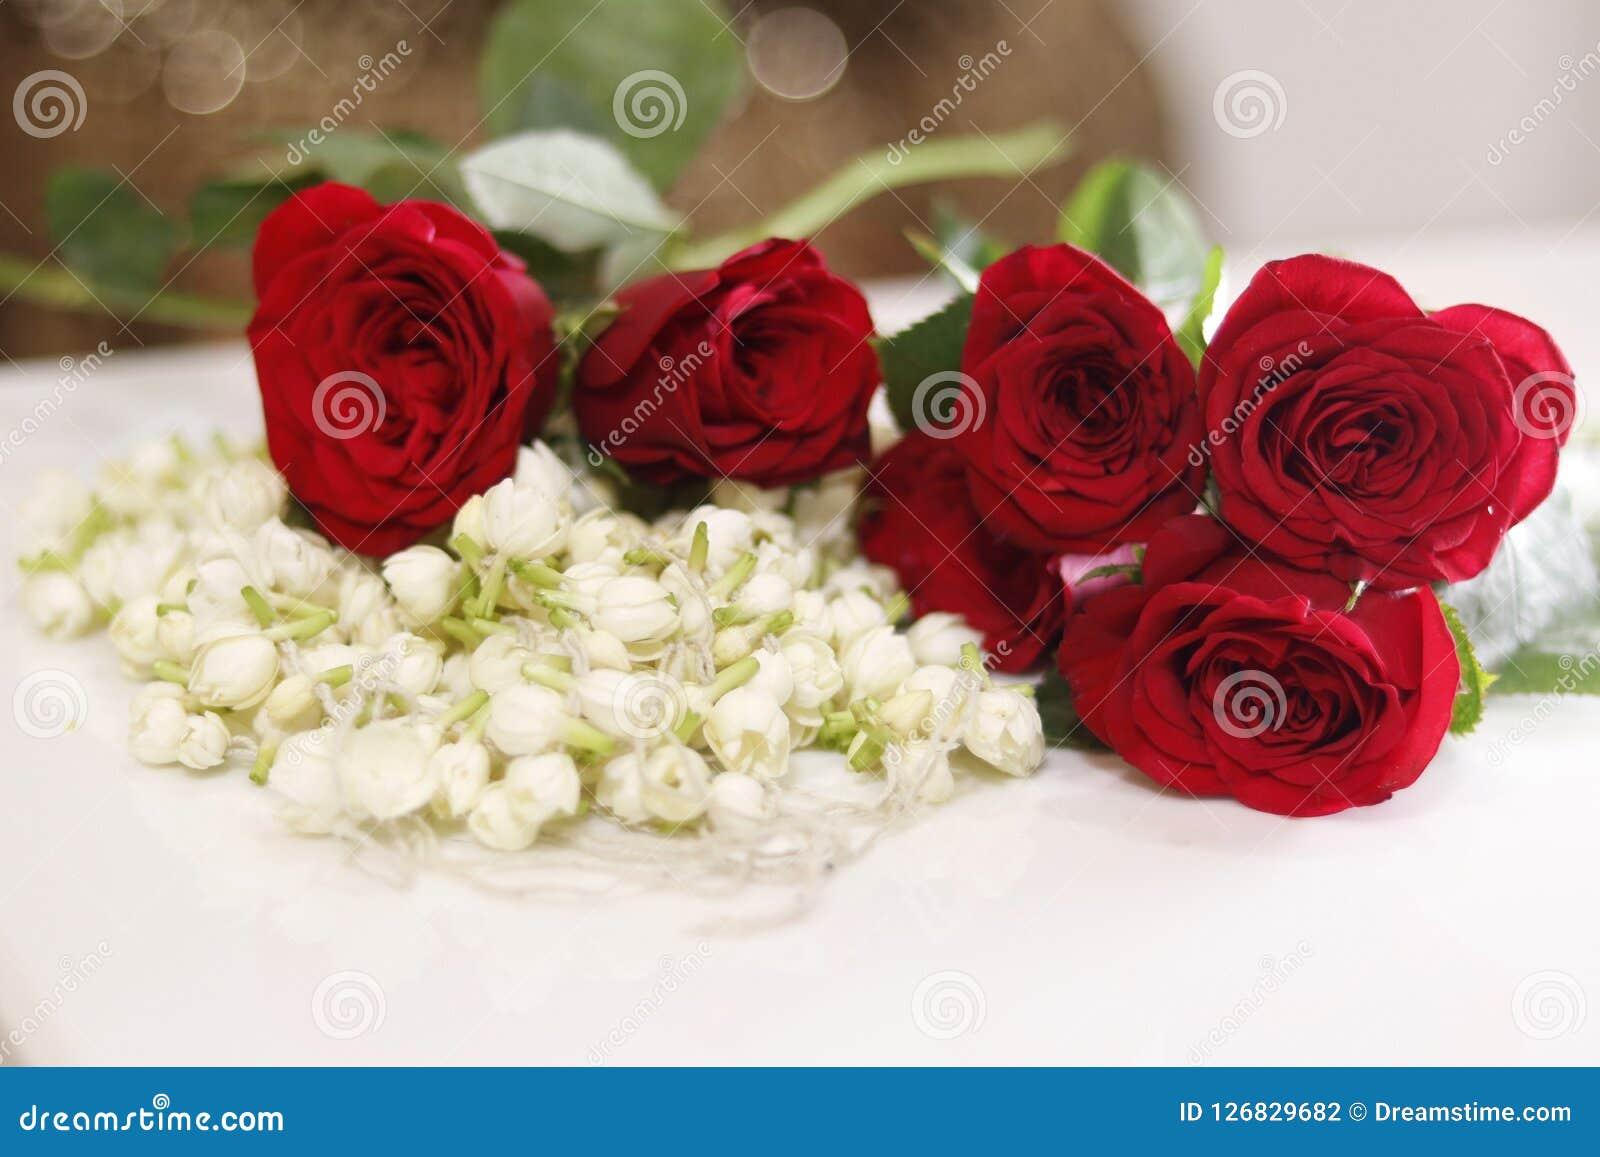 Garland Of Flowers Bridal Wedding Flowers Stock Photo Image Of Adjusting Background 126829682